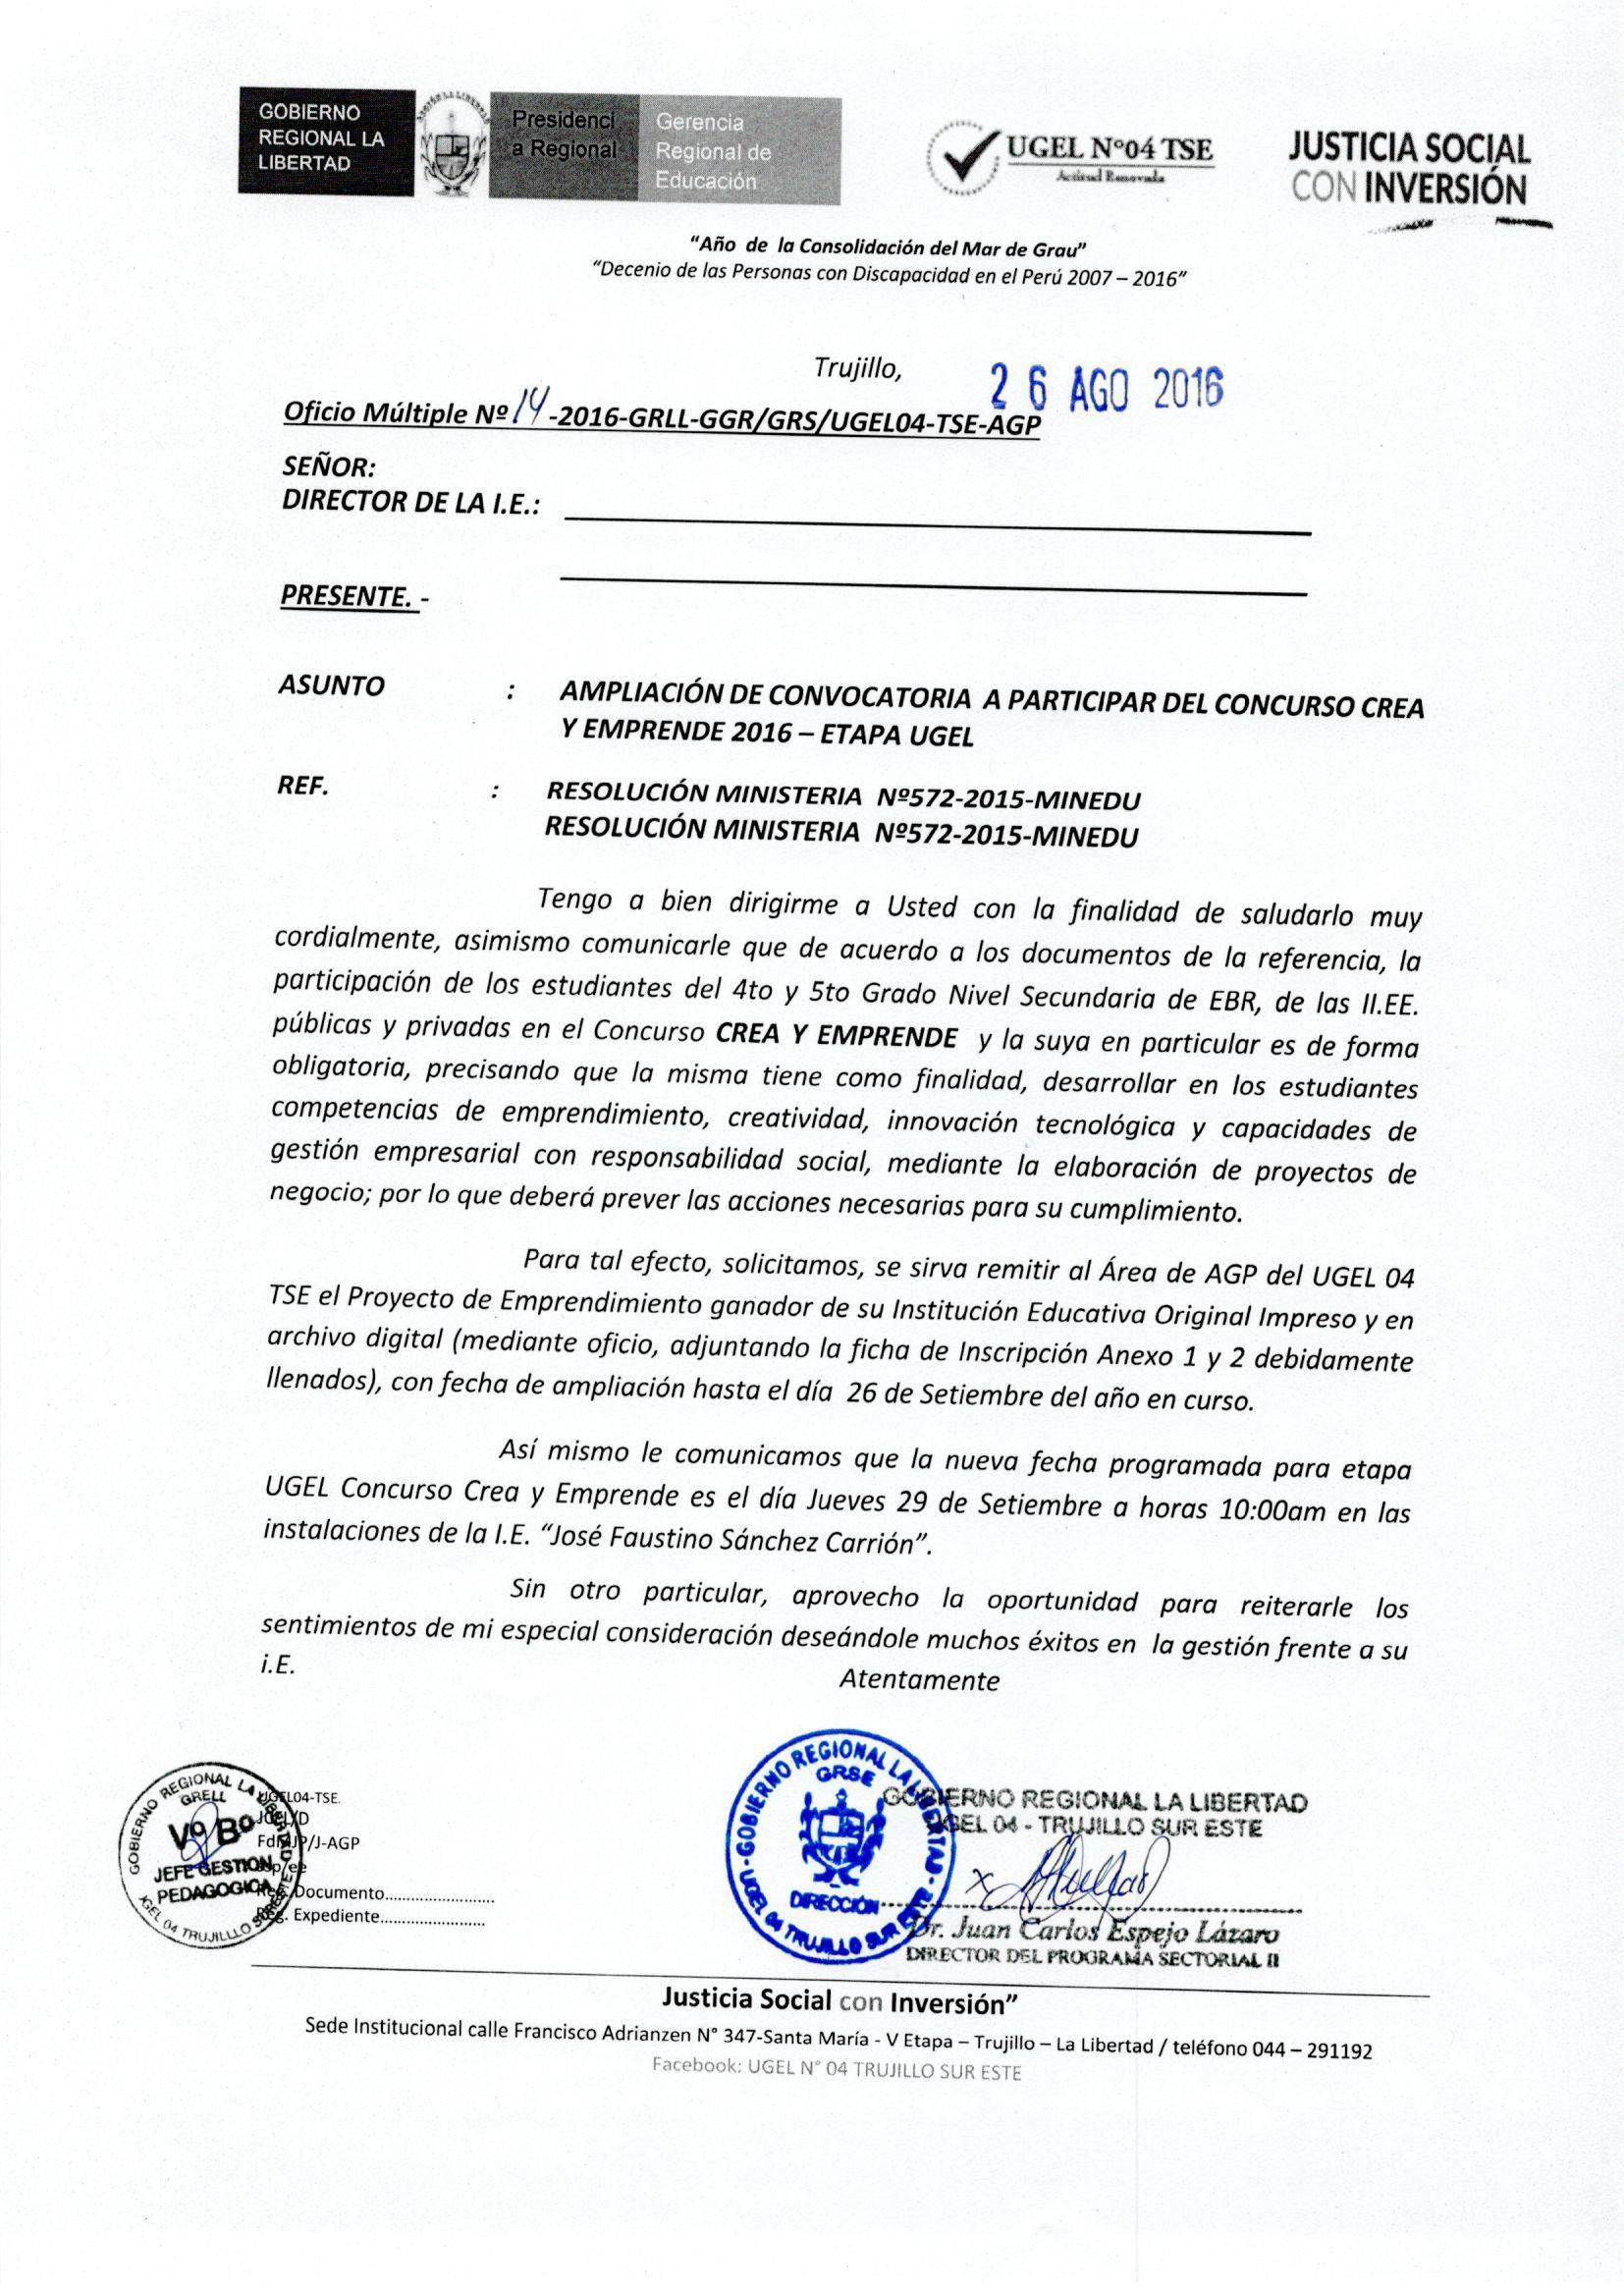 Oficio m ltiple n 14 2016 grll ggr grs ugel04tse agp for Convocatoria para docentes 2016